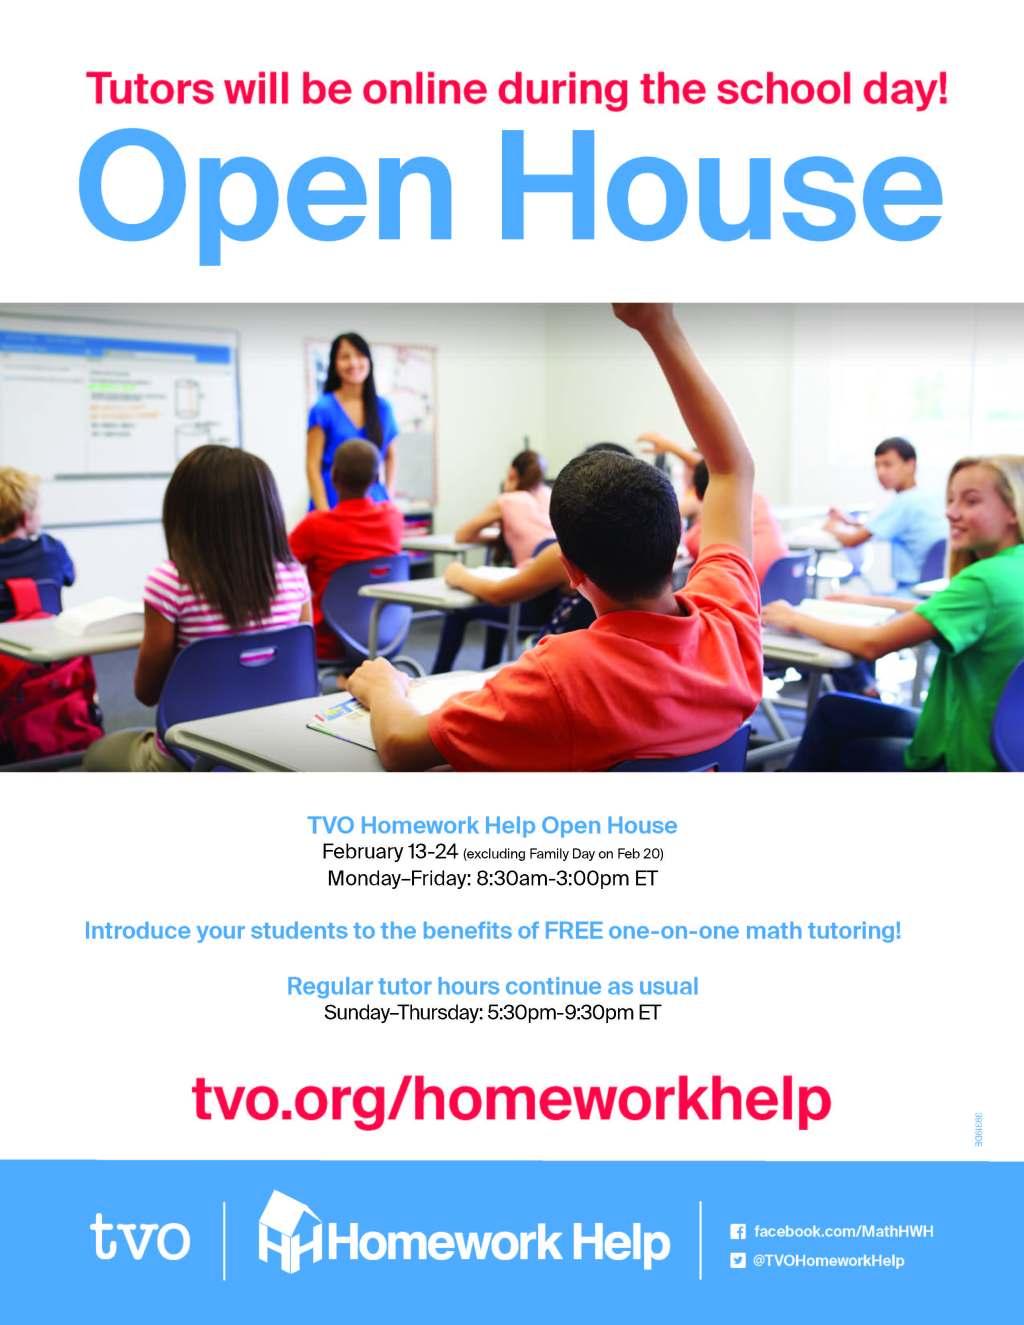 homework-help-open-house-2017